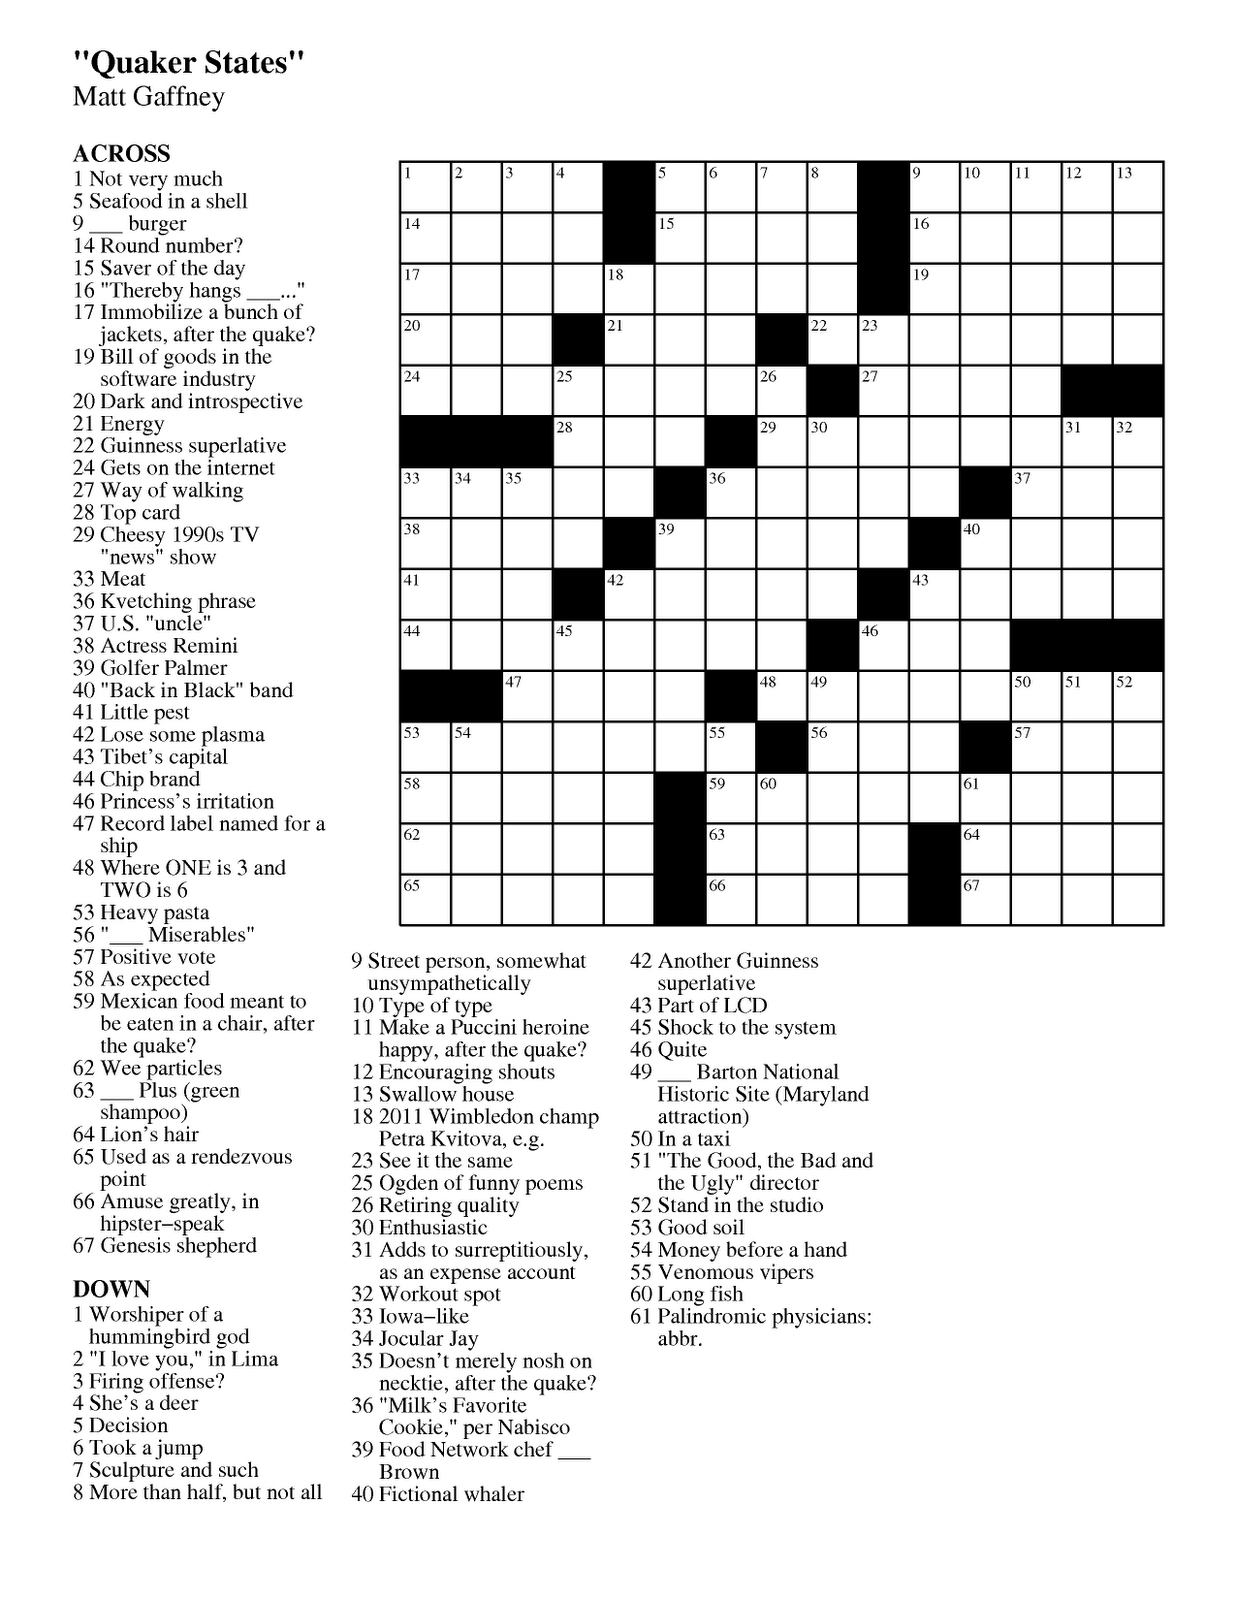 Summer Crossword Puzzle Worksheet - Free Esl Printable Worksheets - Free Printable Crossword Puzzle Worksheets